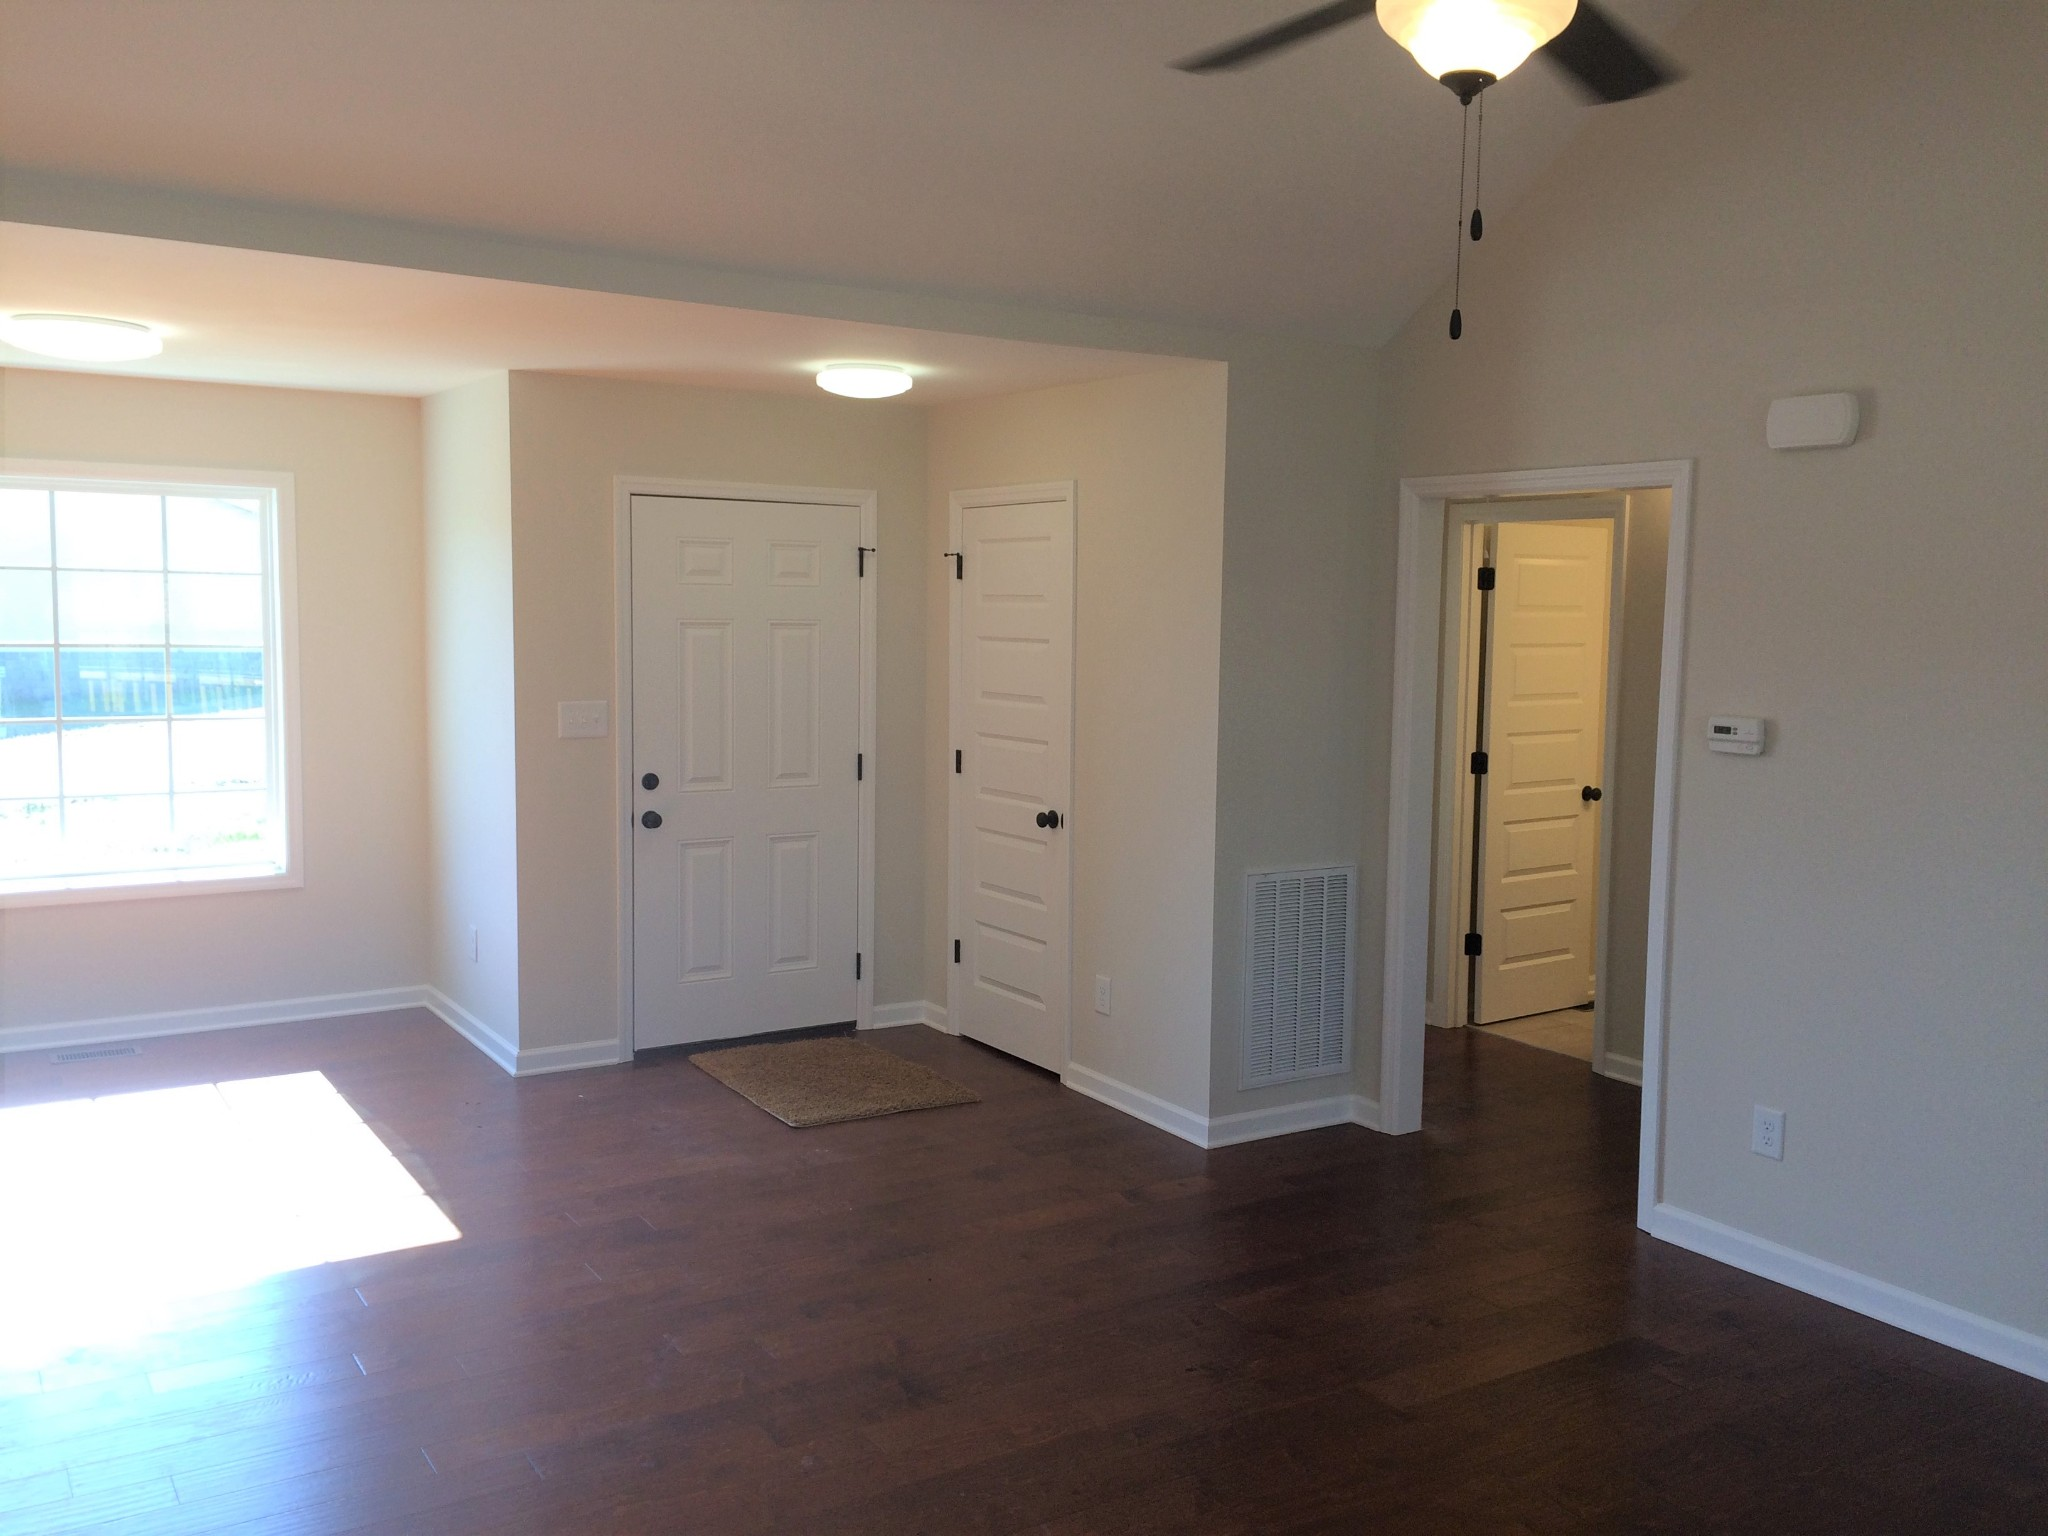 273 Modena Cir, Decherd, TN 37324 - Decherd, TN real estate listing